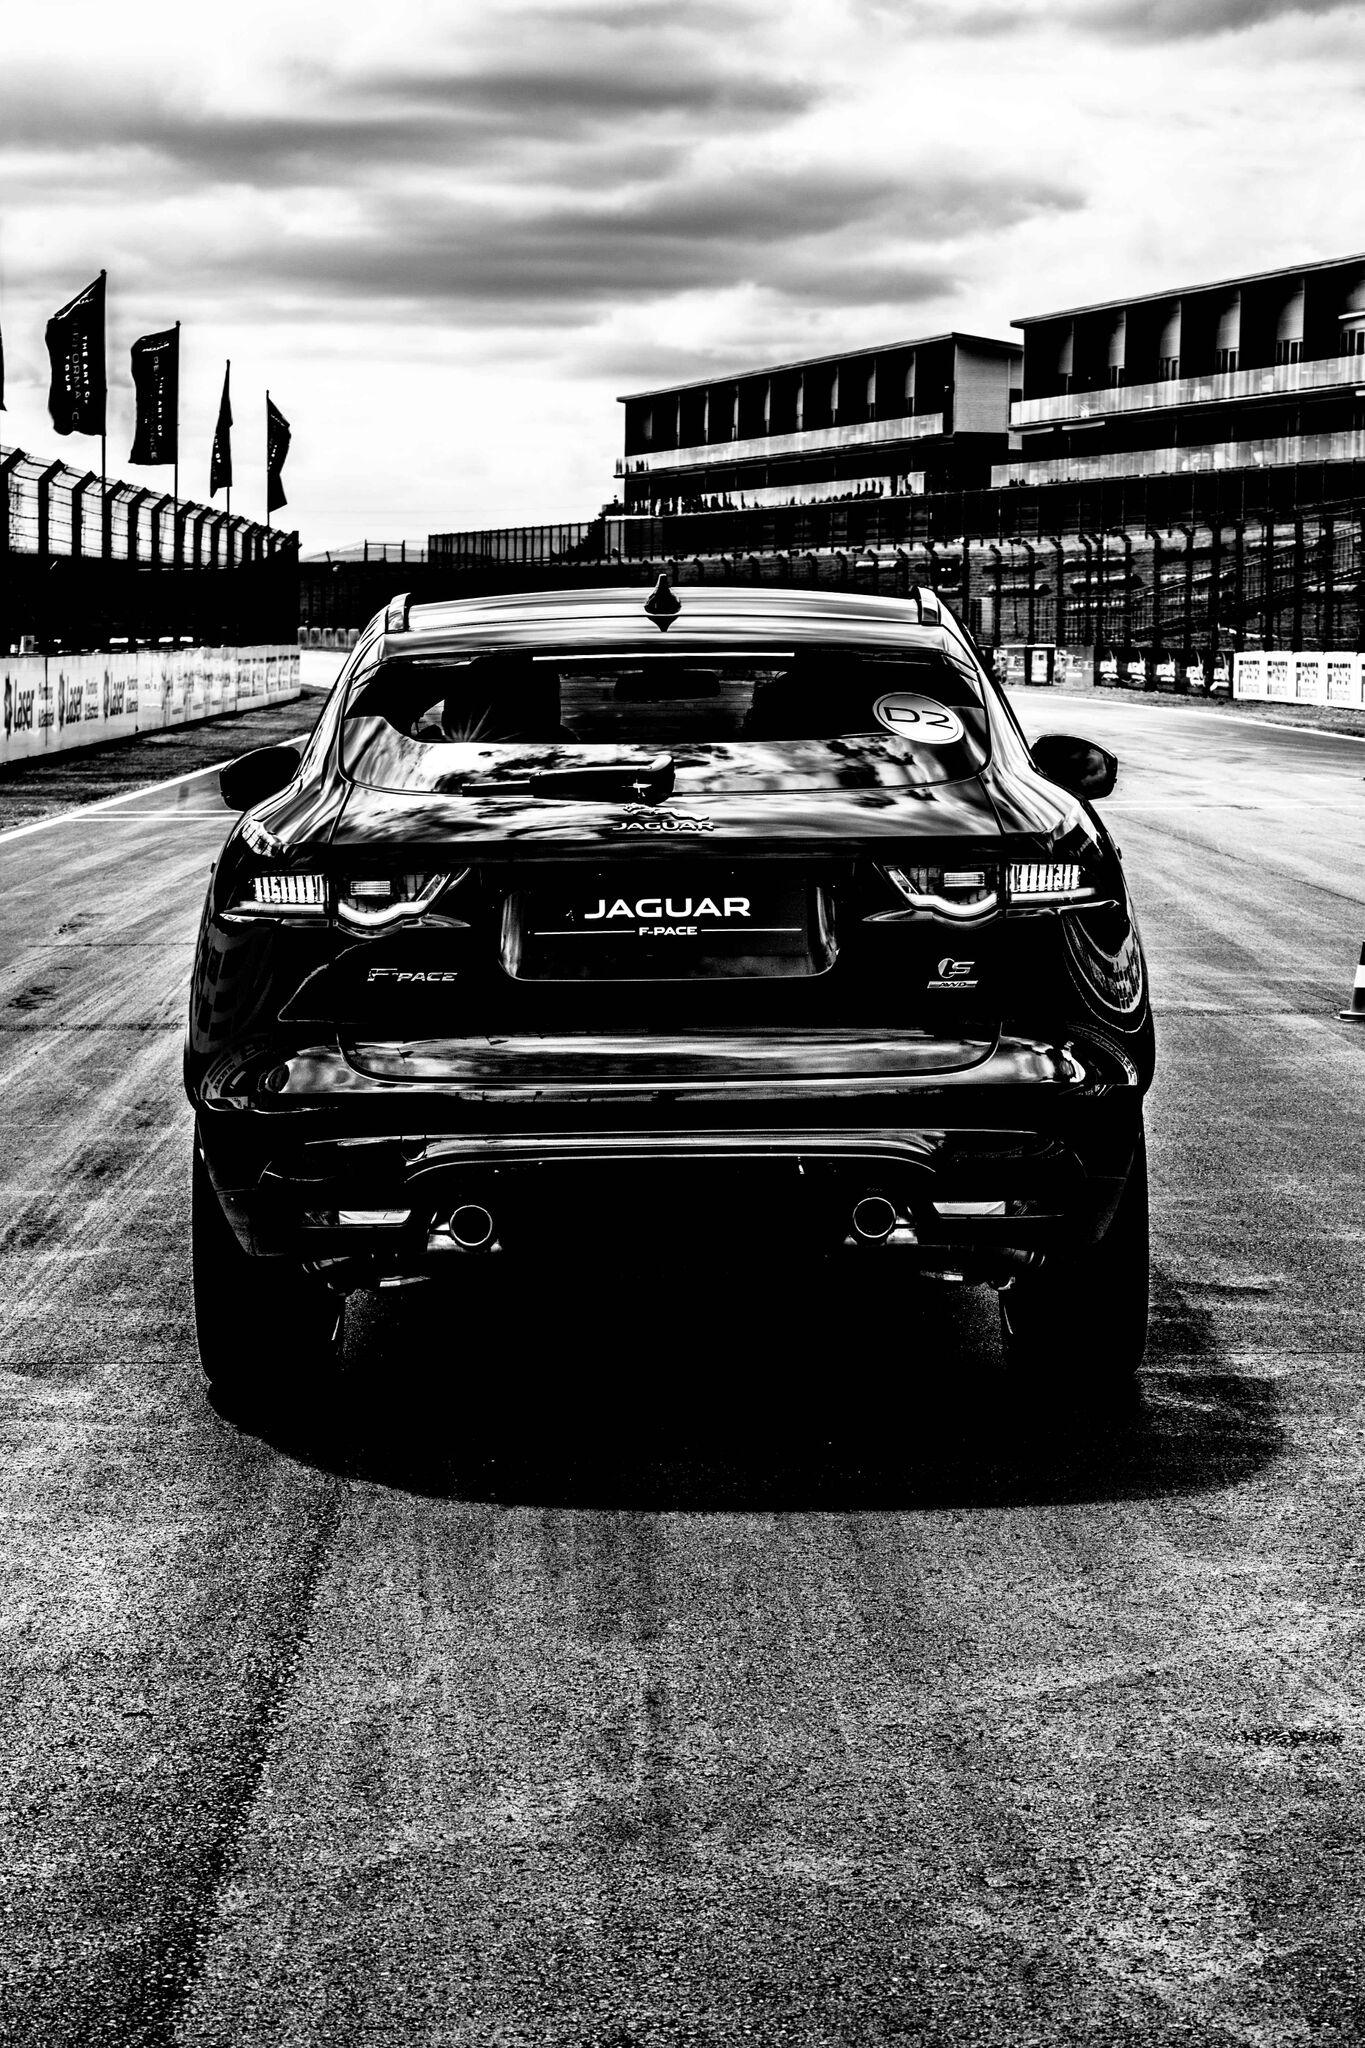 Jaguar - Art of Performance - WED AFTERNOON 2MB-108_preview.jpeg